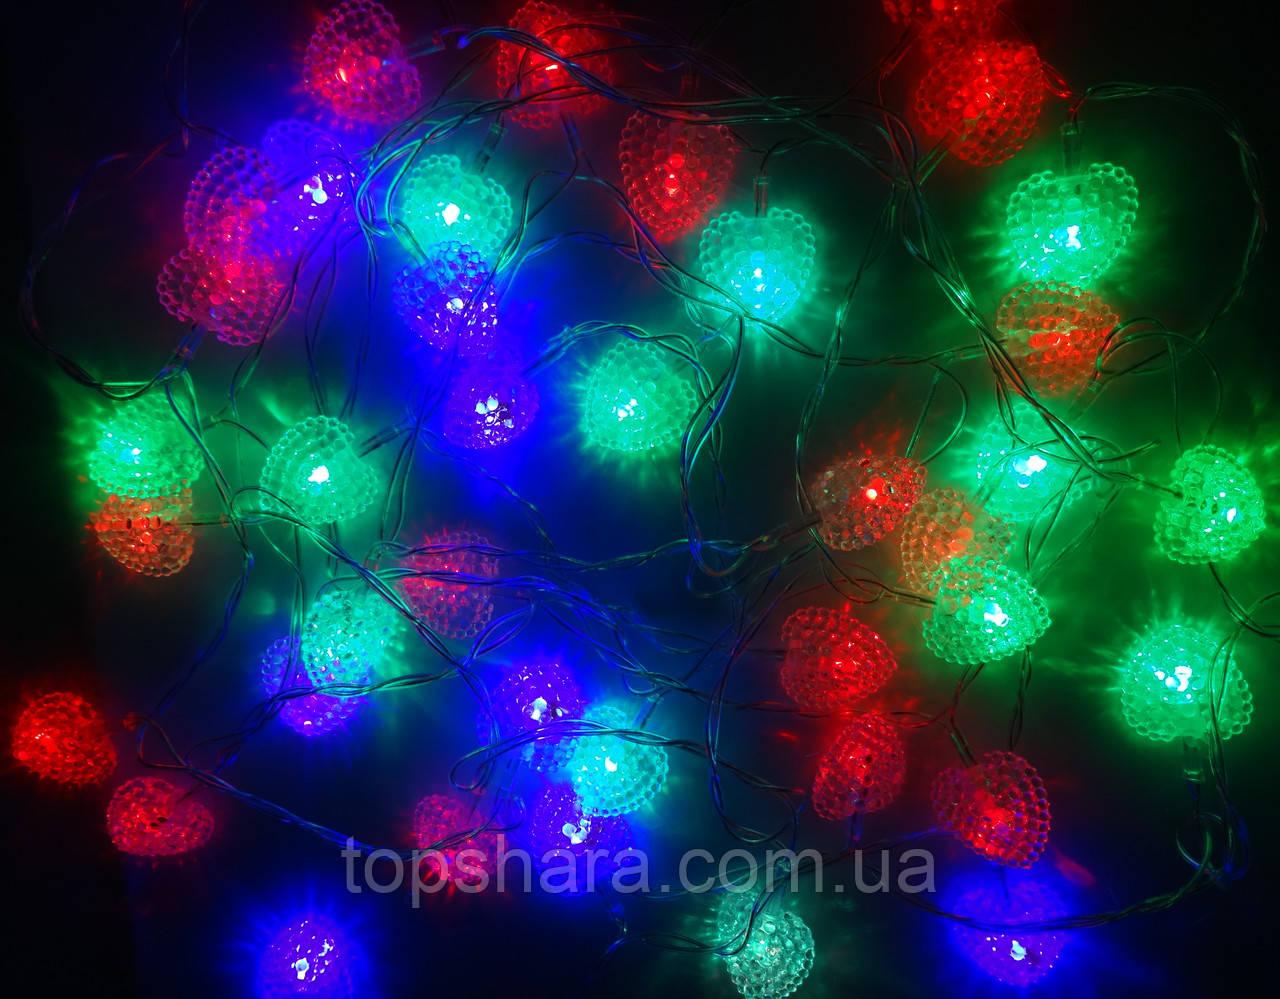 Светодиодная Гирлянда Сердечки Новогодняя на Елку 4.8м  40 LED Мульти